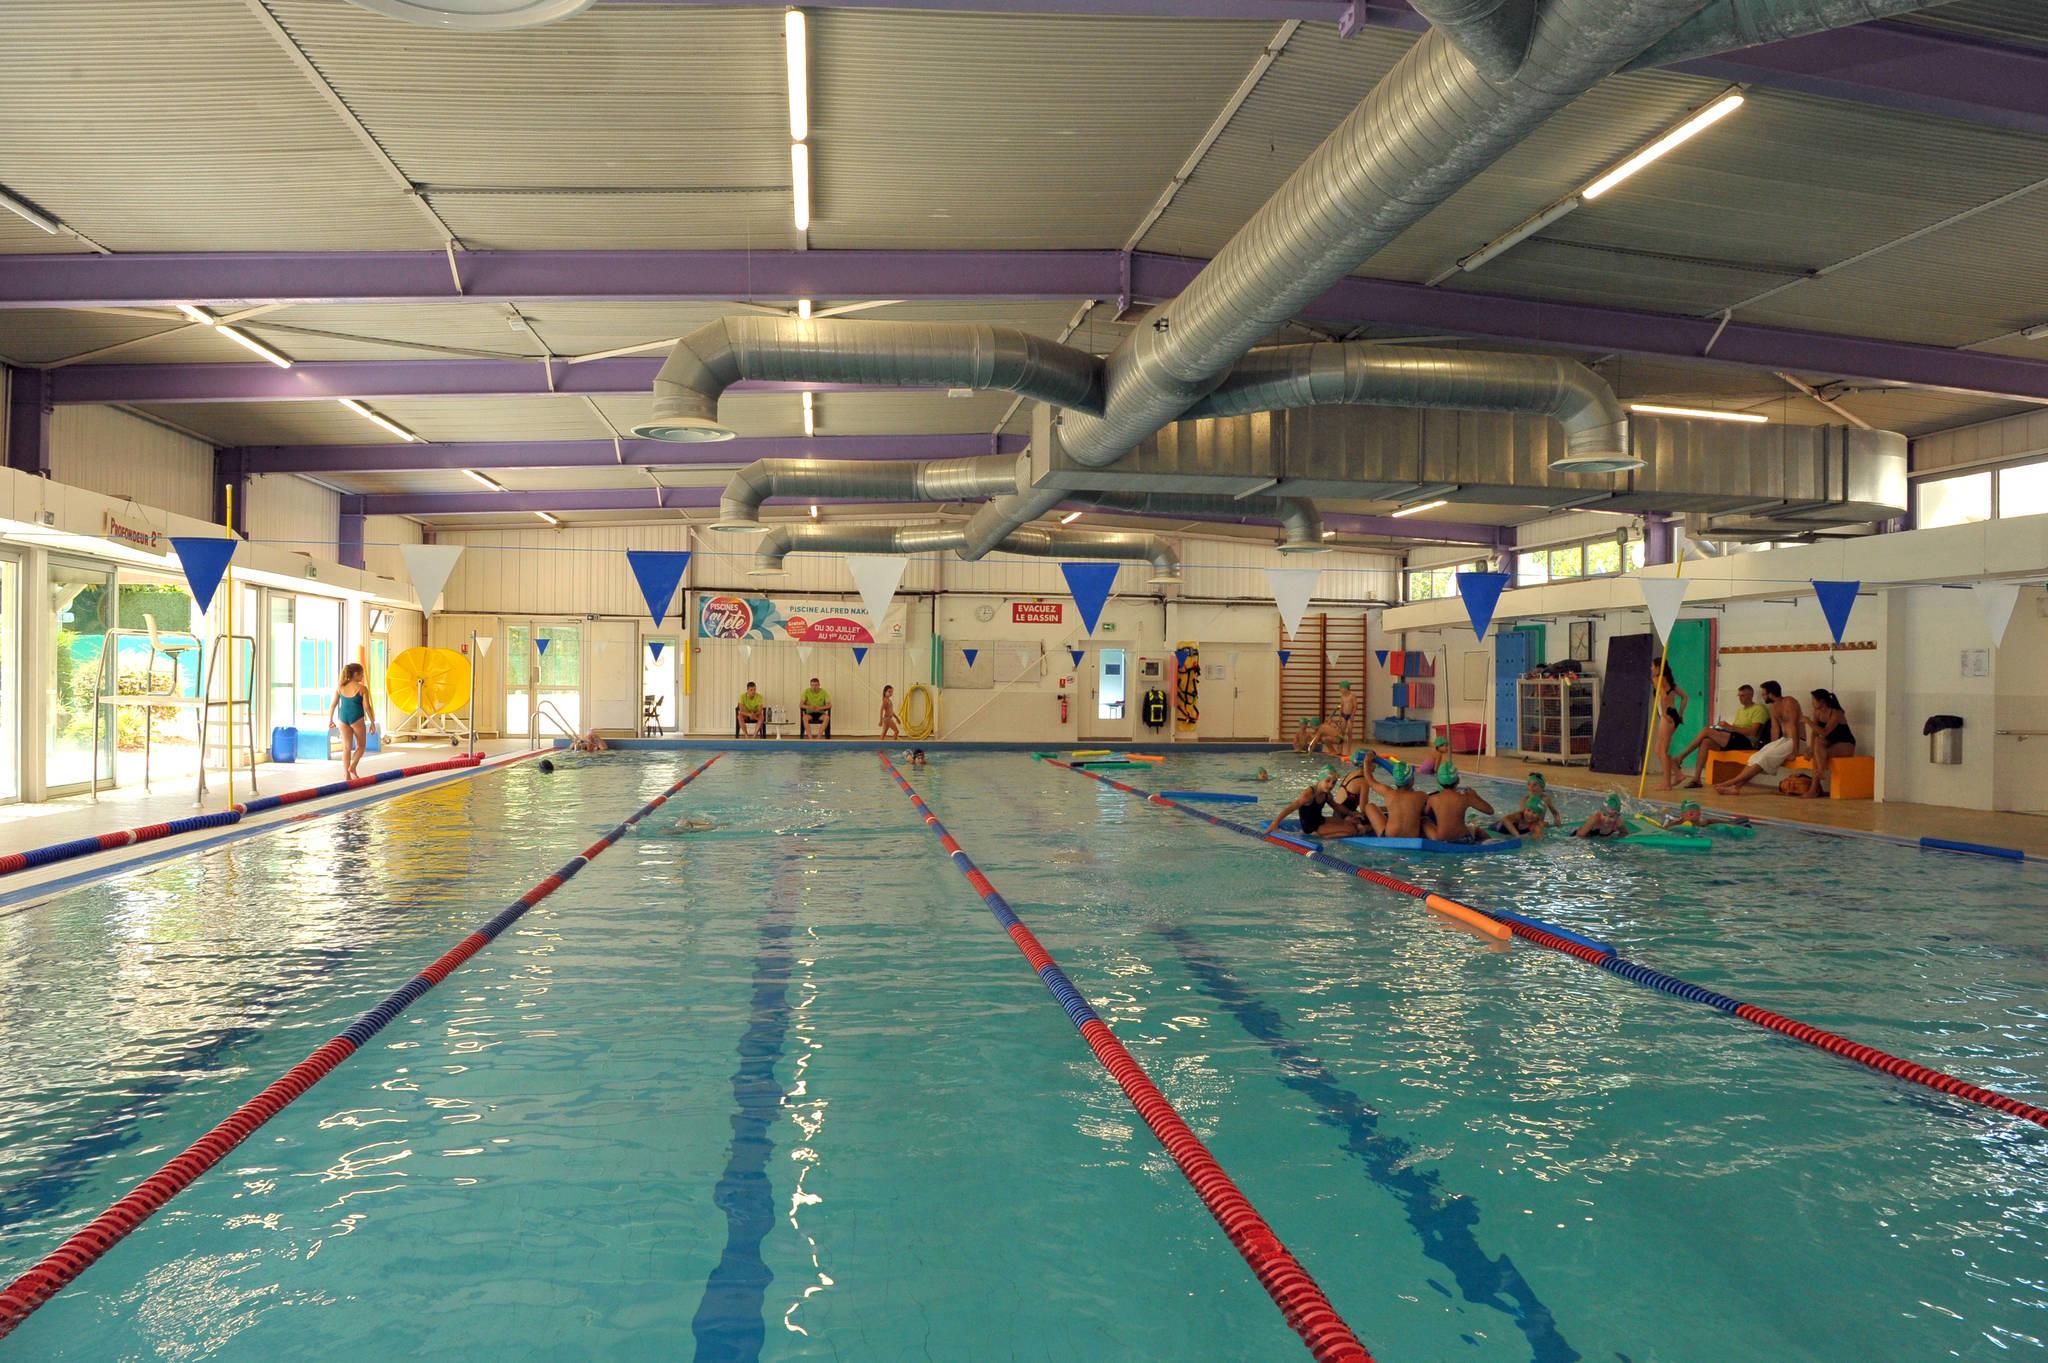 Piscine Alfred Nakache, Swimming-Pool - Montpellier Tourist ... dedans Piscine Nakache Montpellier